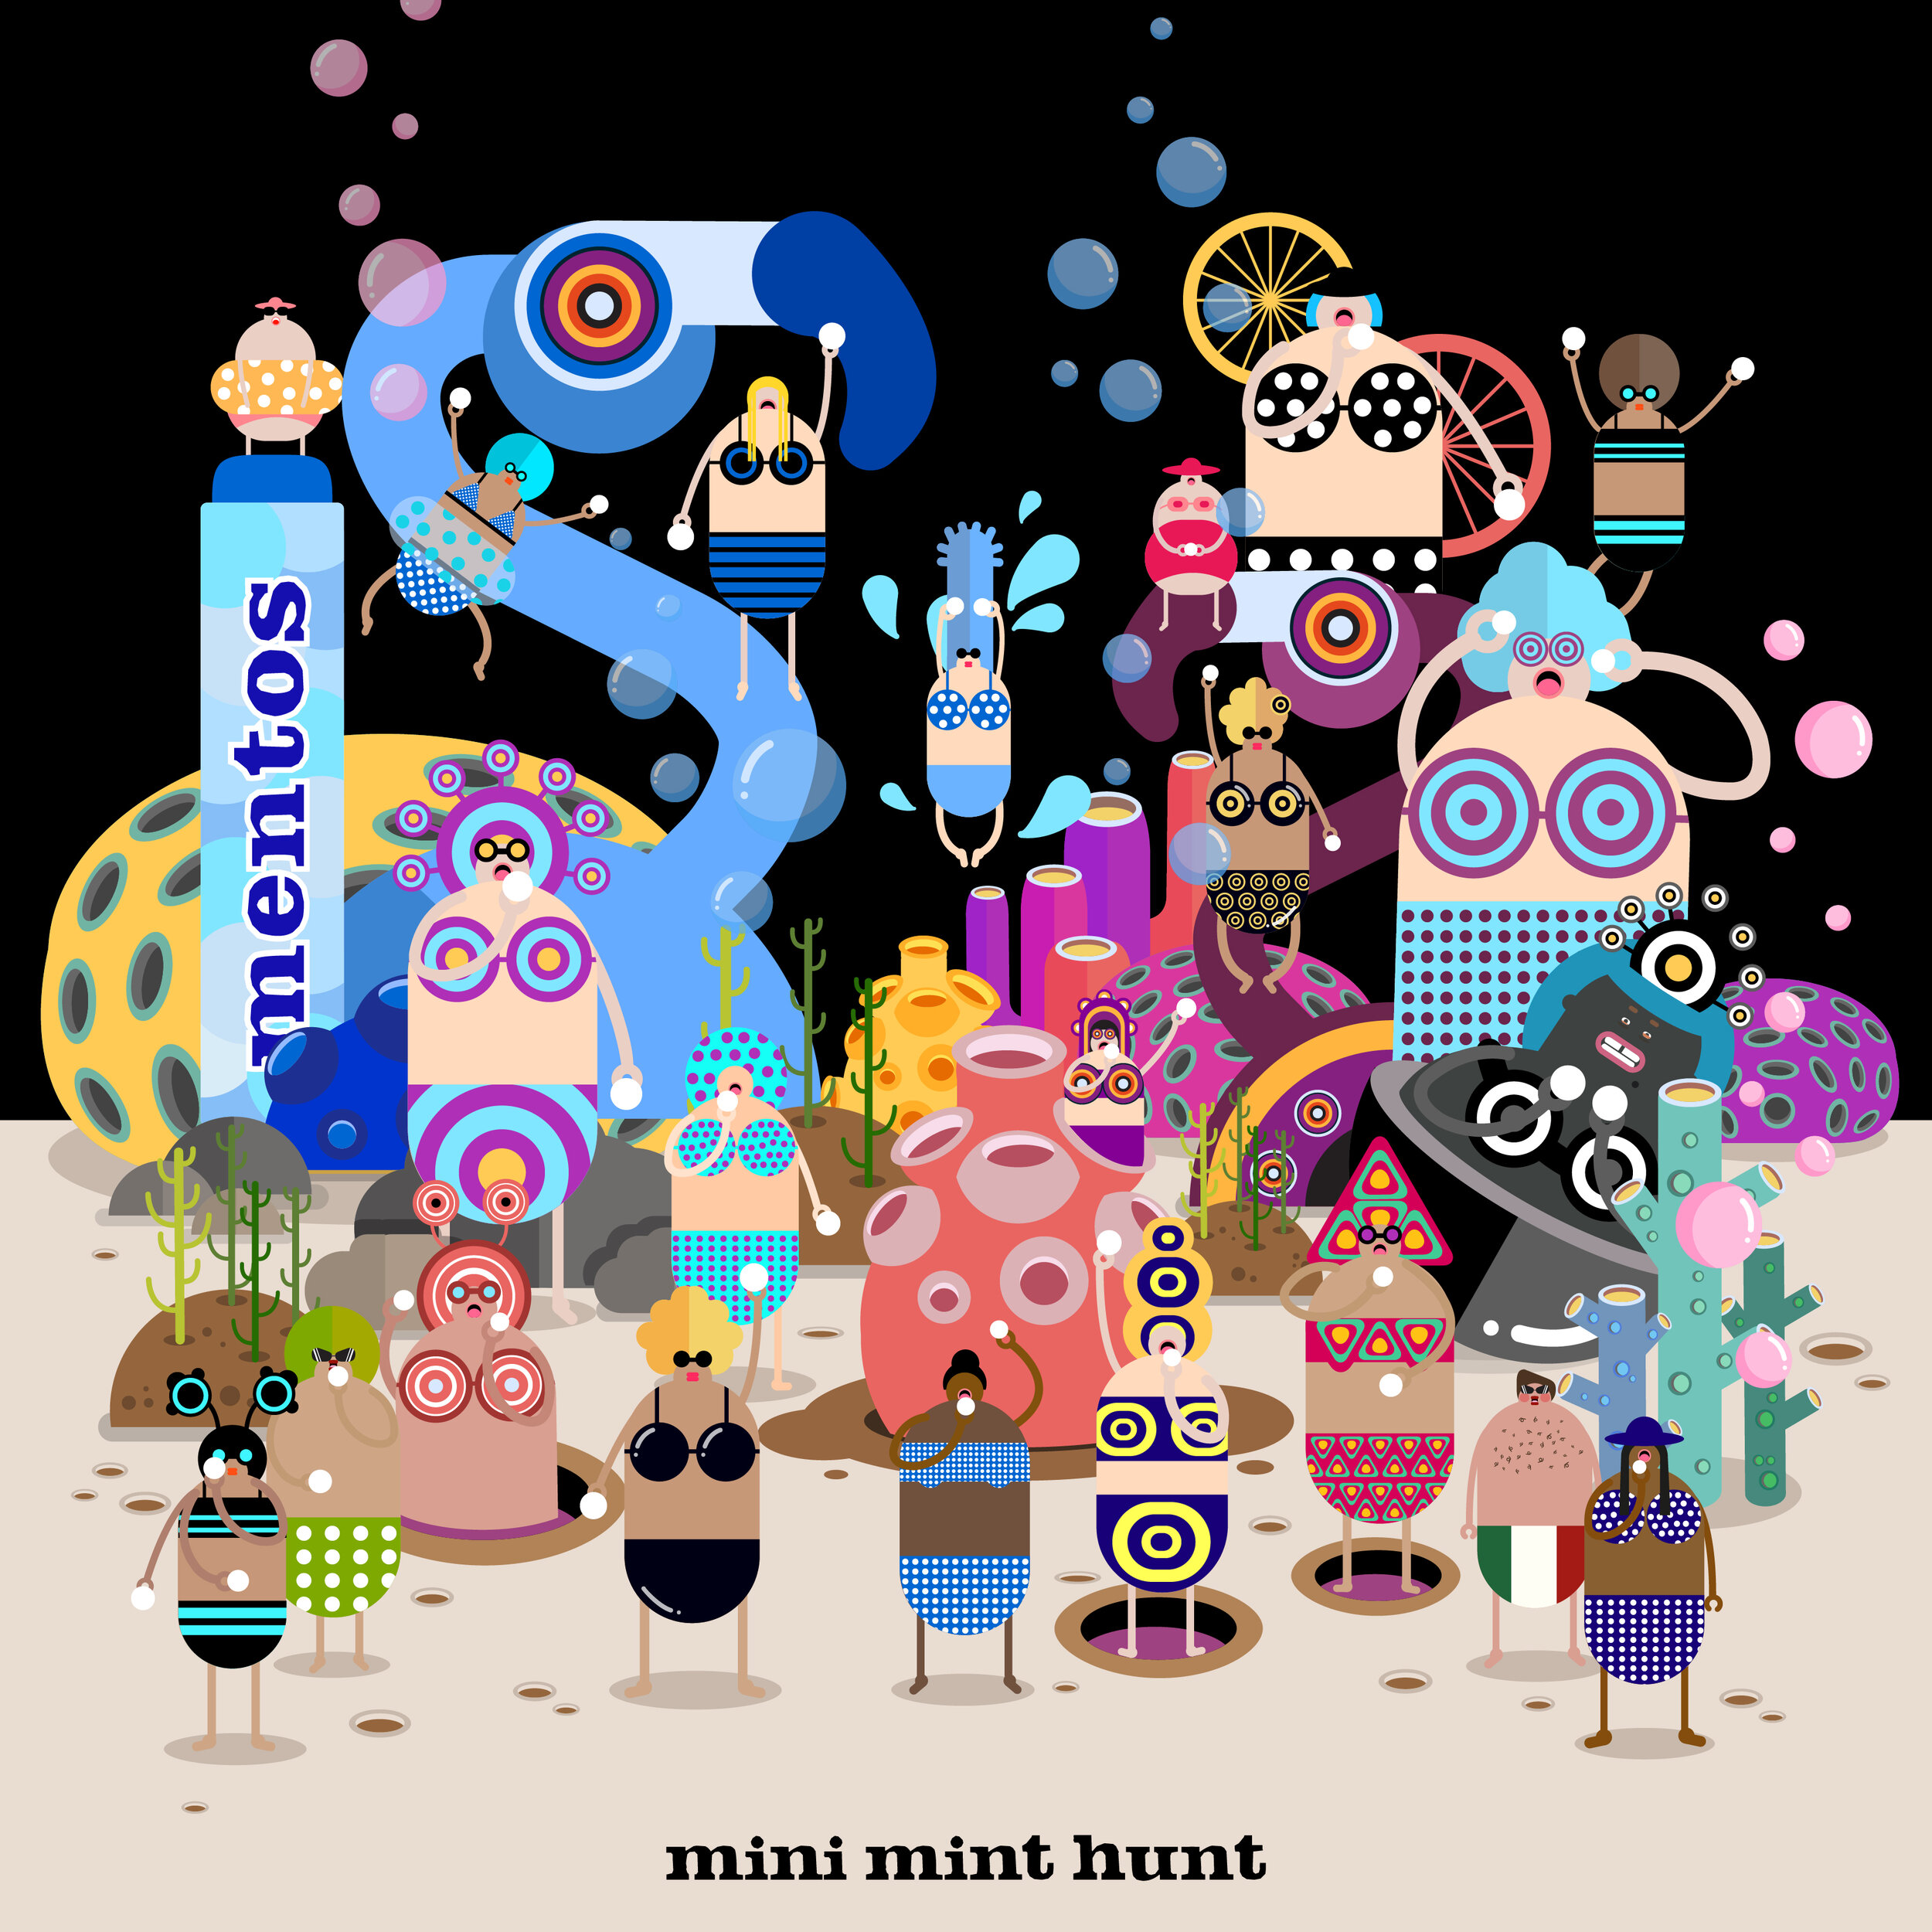 150625-Mentos-Miniminthunt-01.jpg